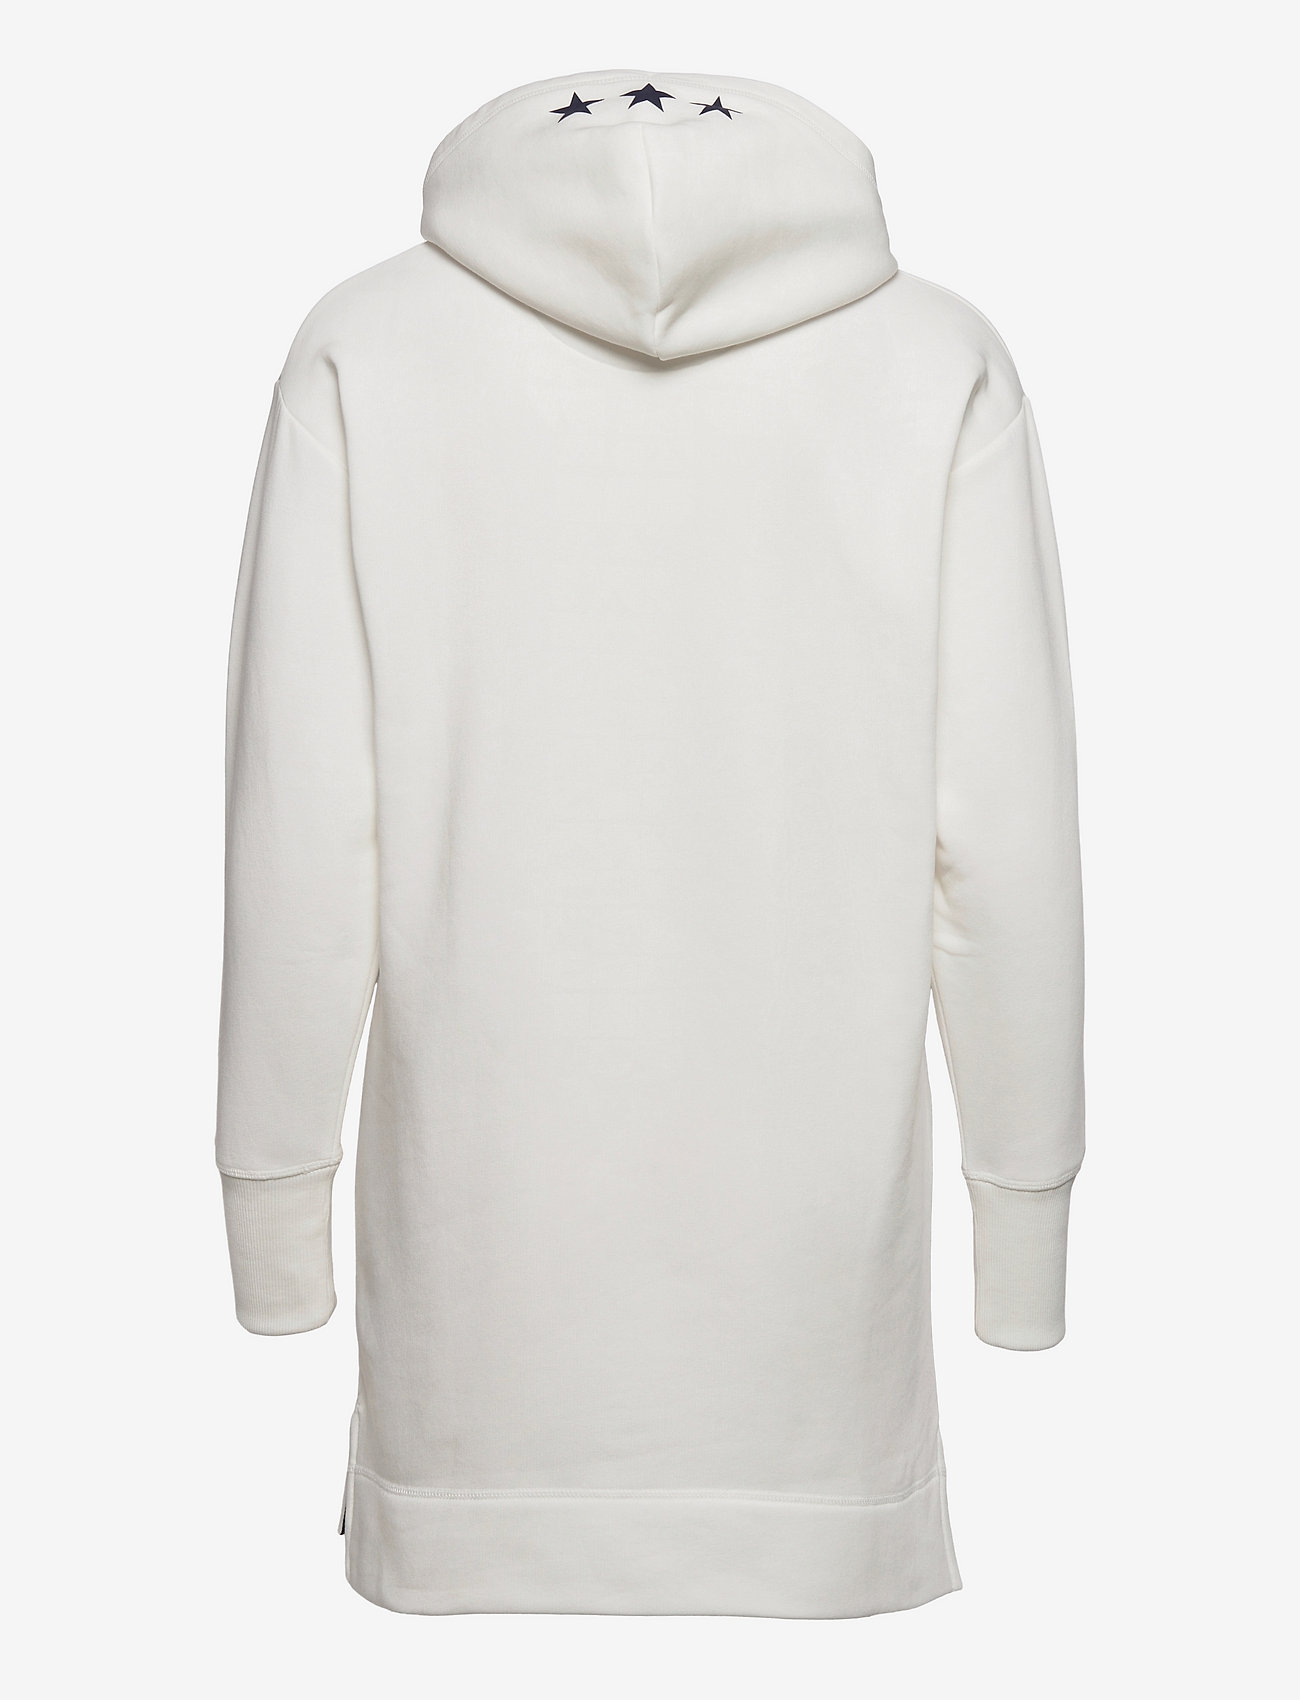 GANT - D2. GANT RETRO SHIELD HOODIE DRESS - t-shirt dresses - eggshell - 1